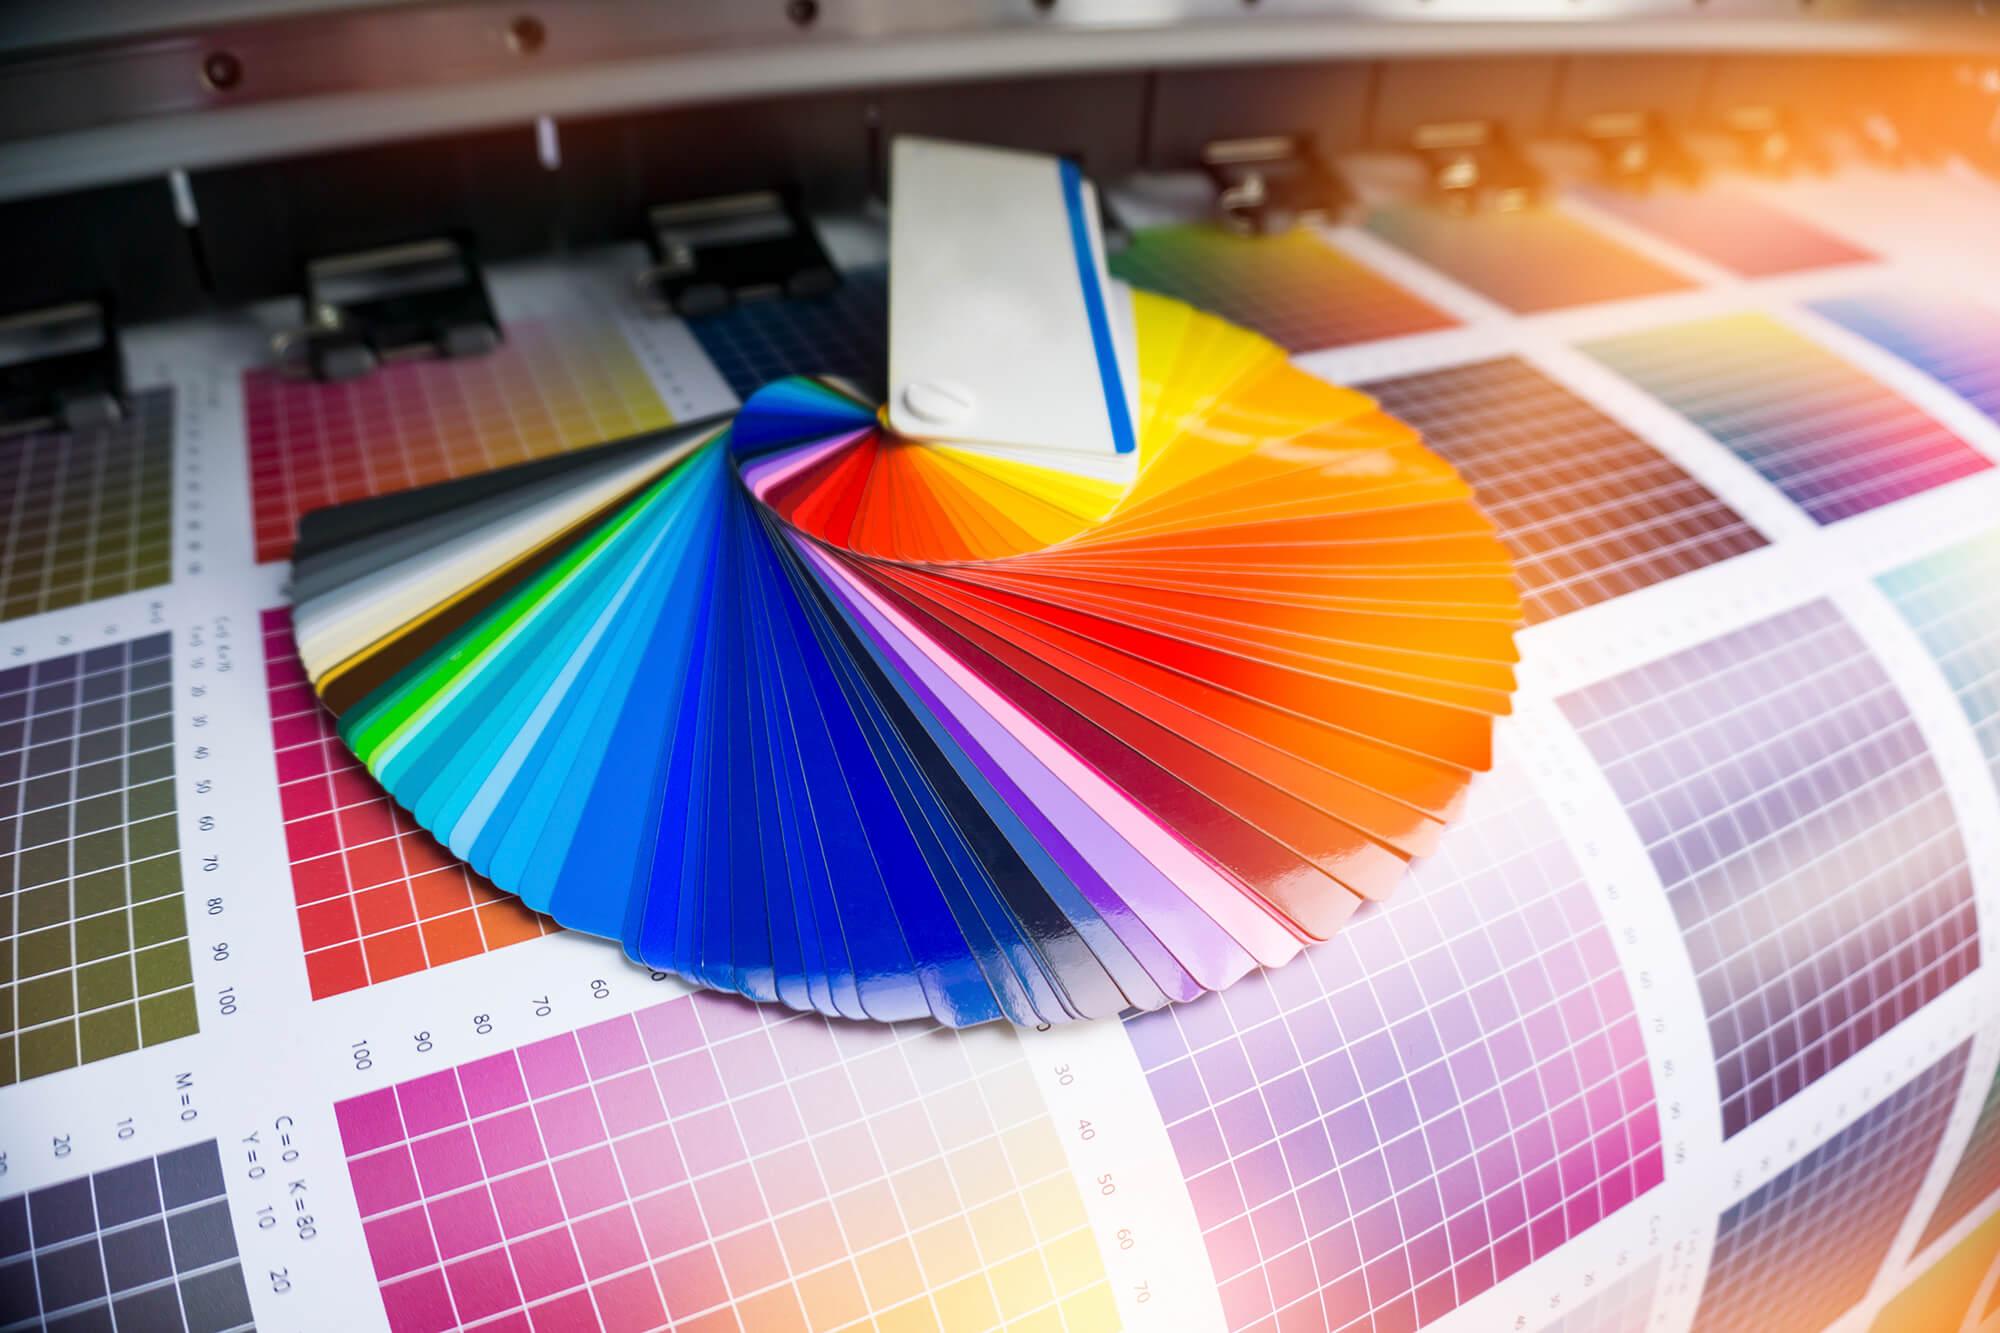 druk kolorowy, wydruk kolorowy, kolorowy druk na drewnie